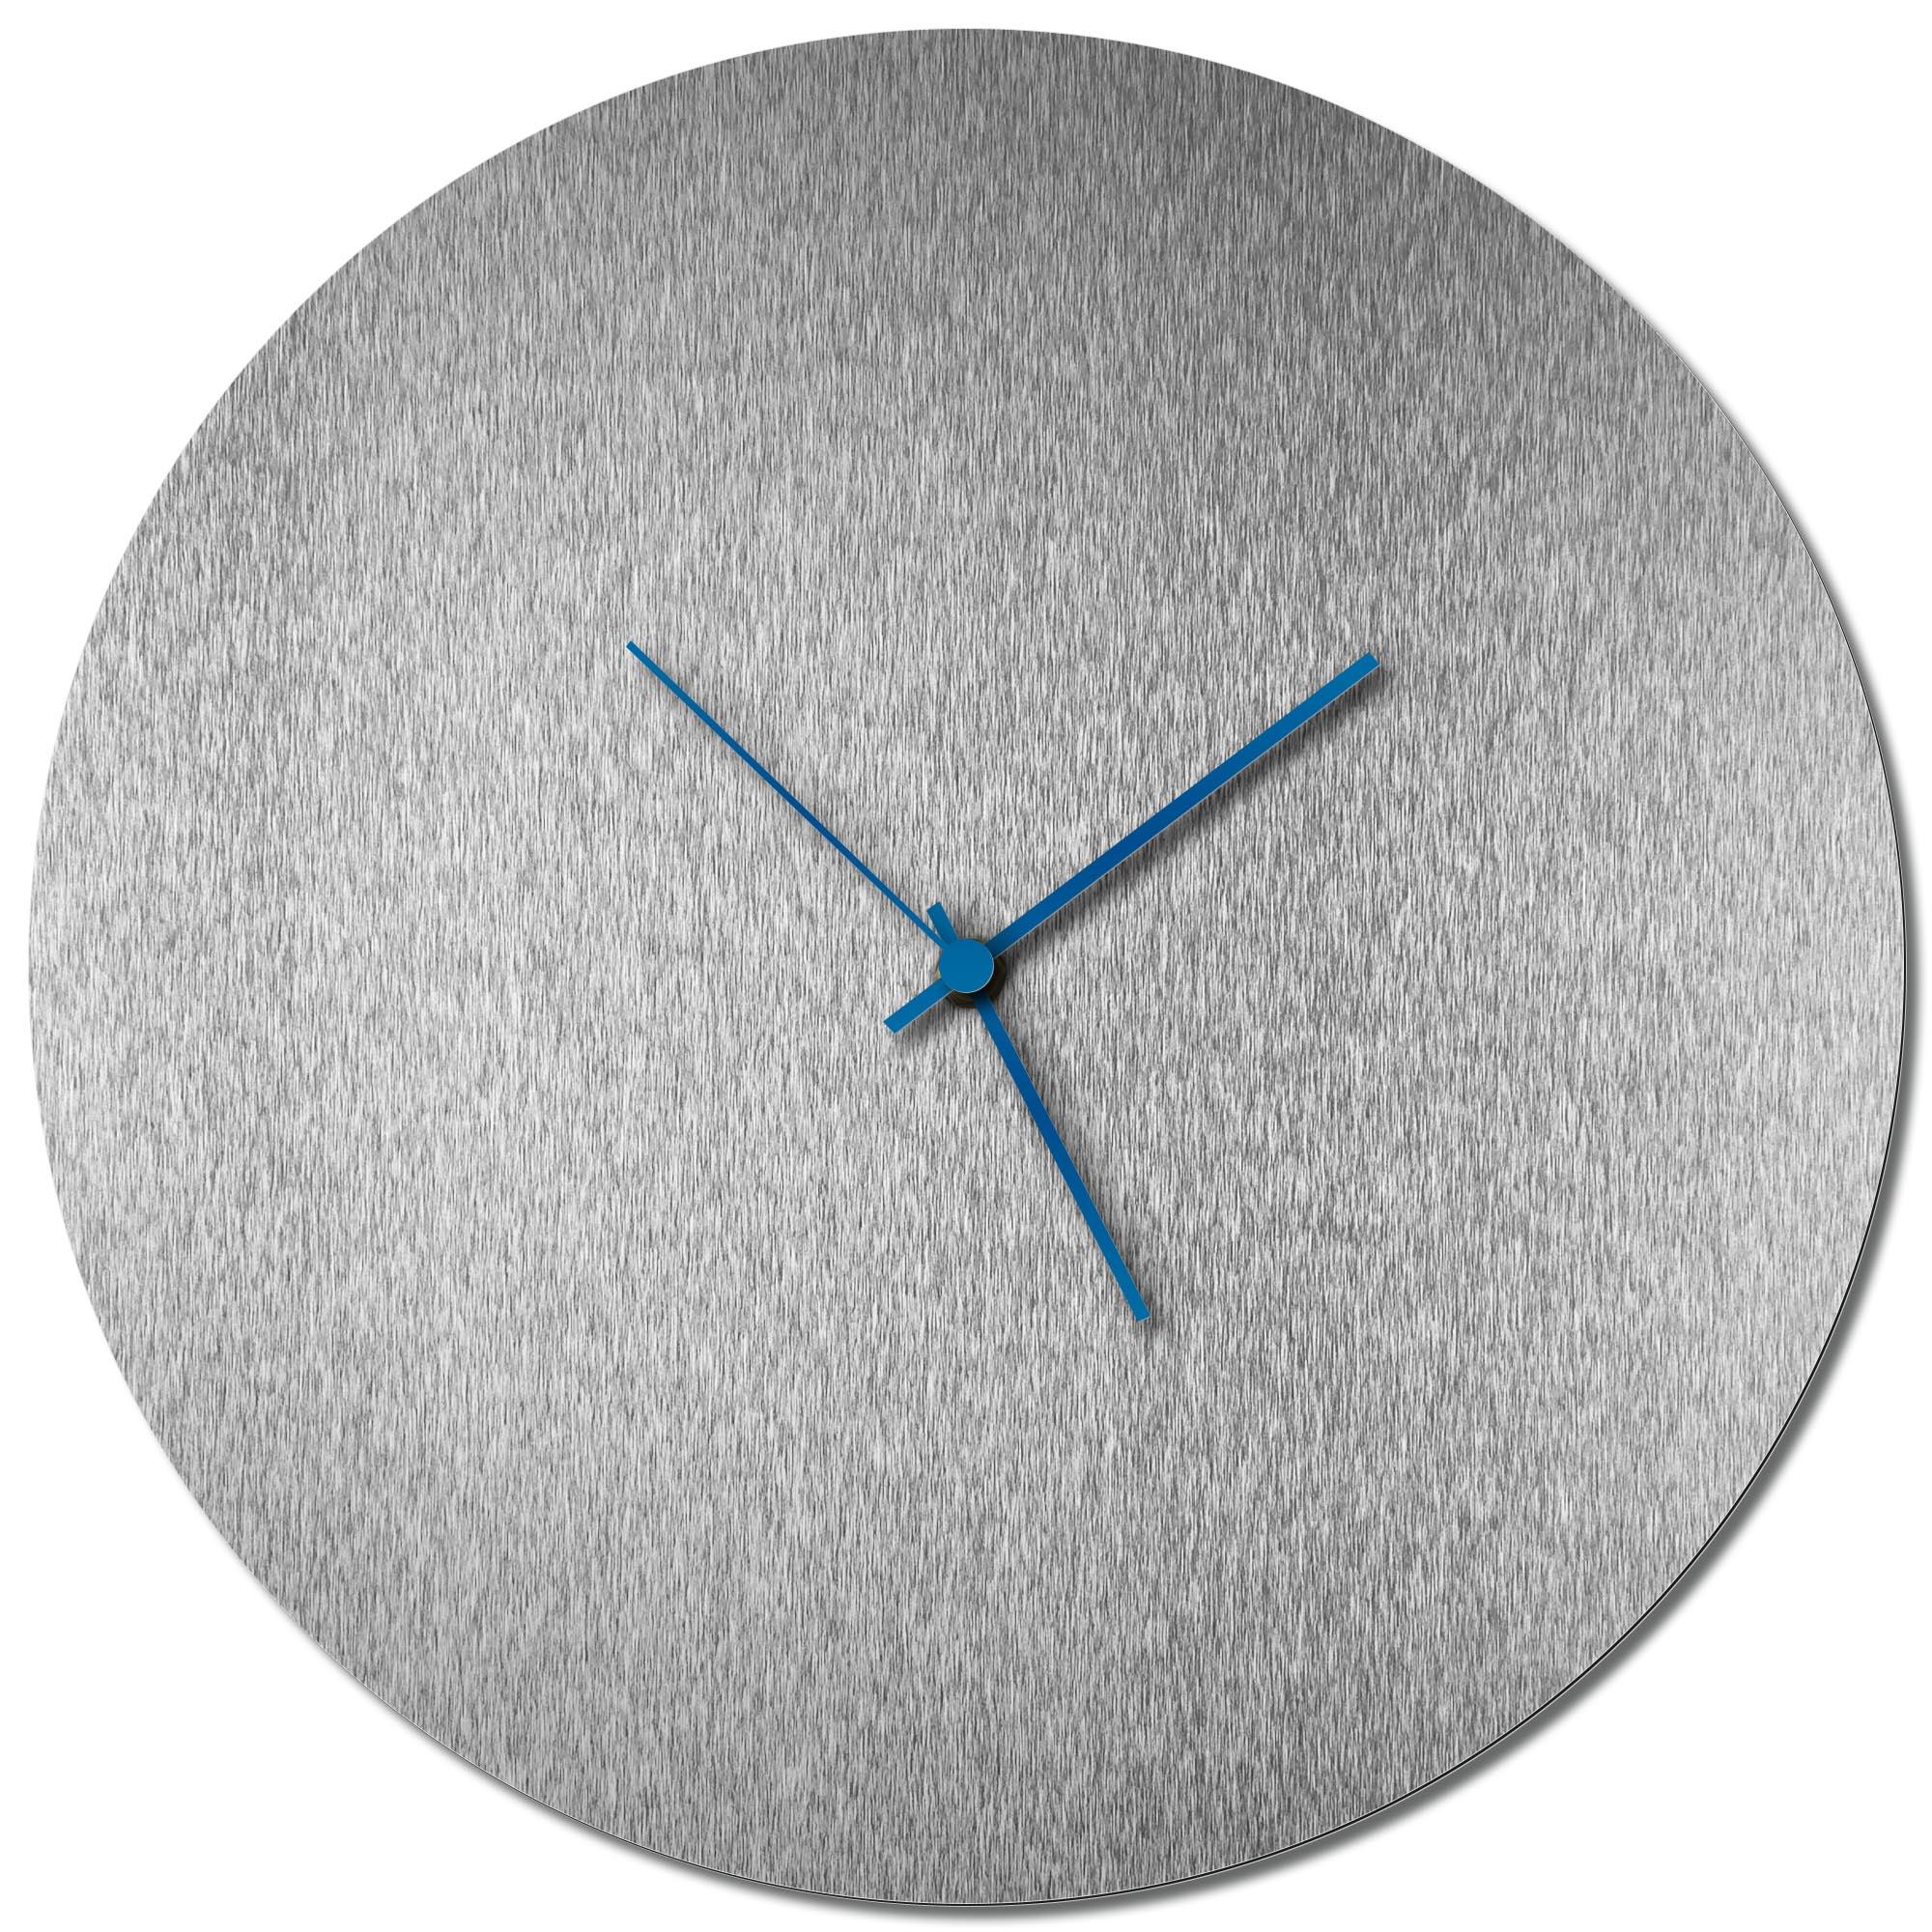 Adam Schwoeppe 'Silversmith Circle Clock Large Blue' Midcentury Modern Style Wall Clock